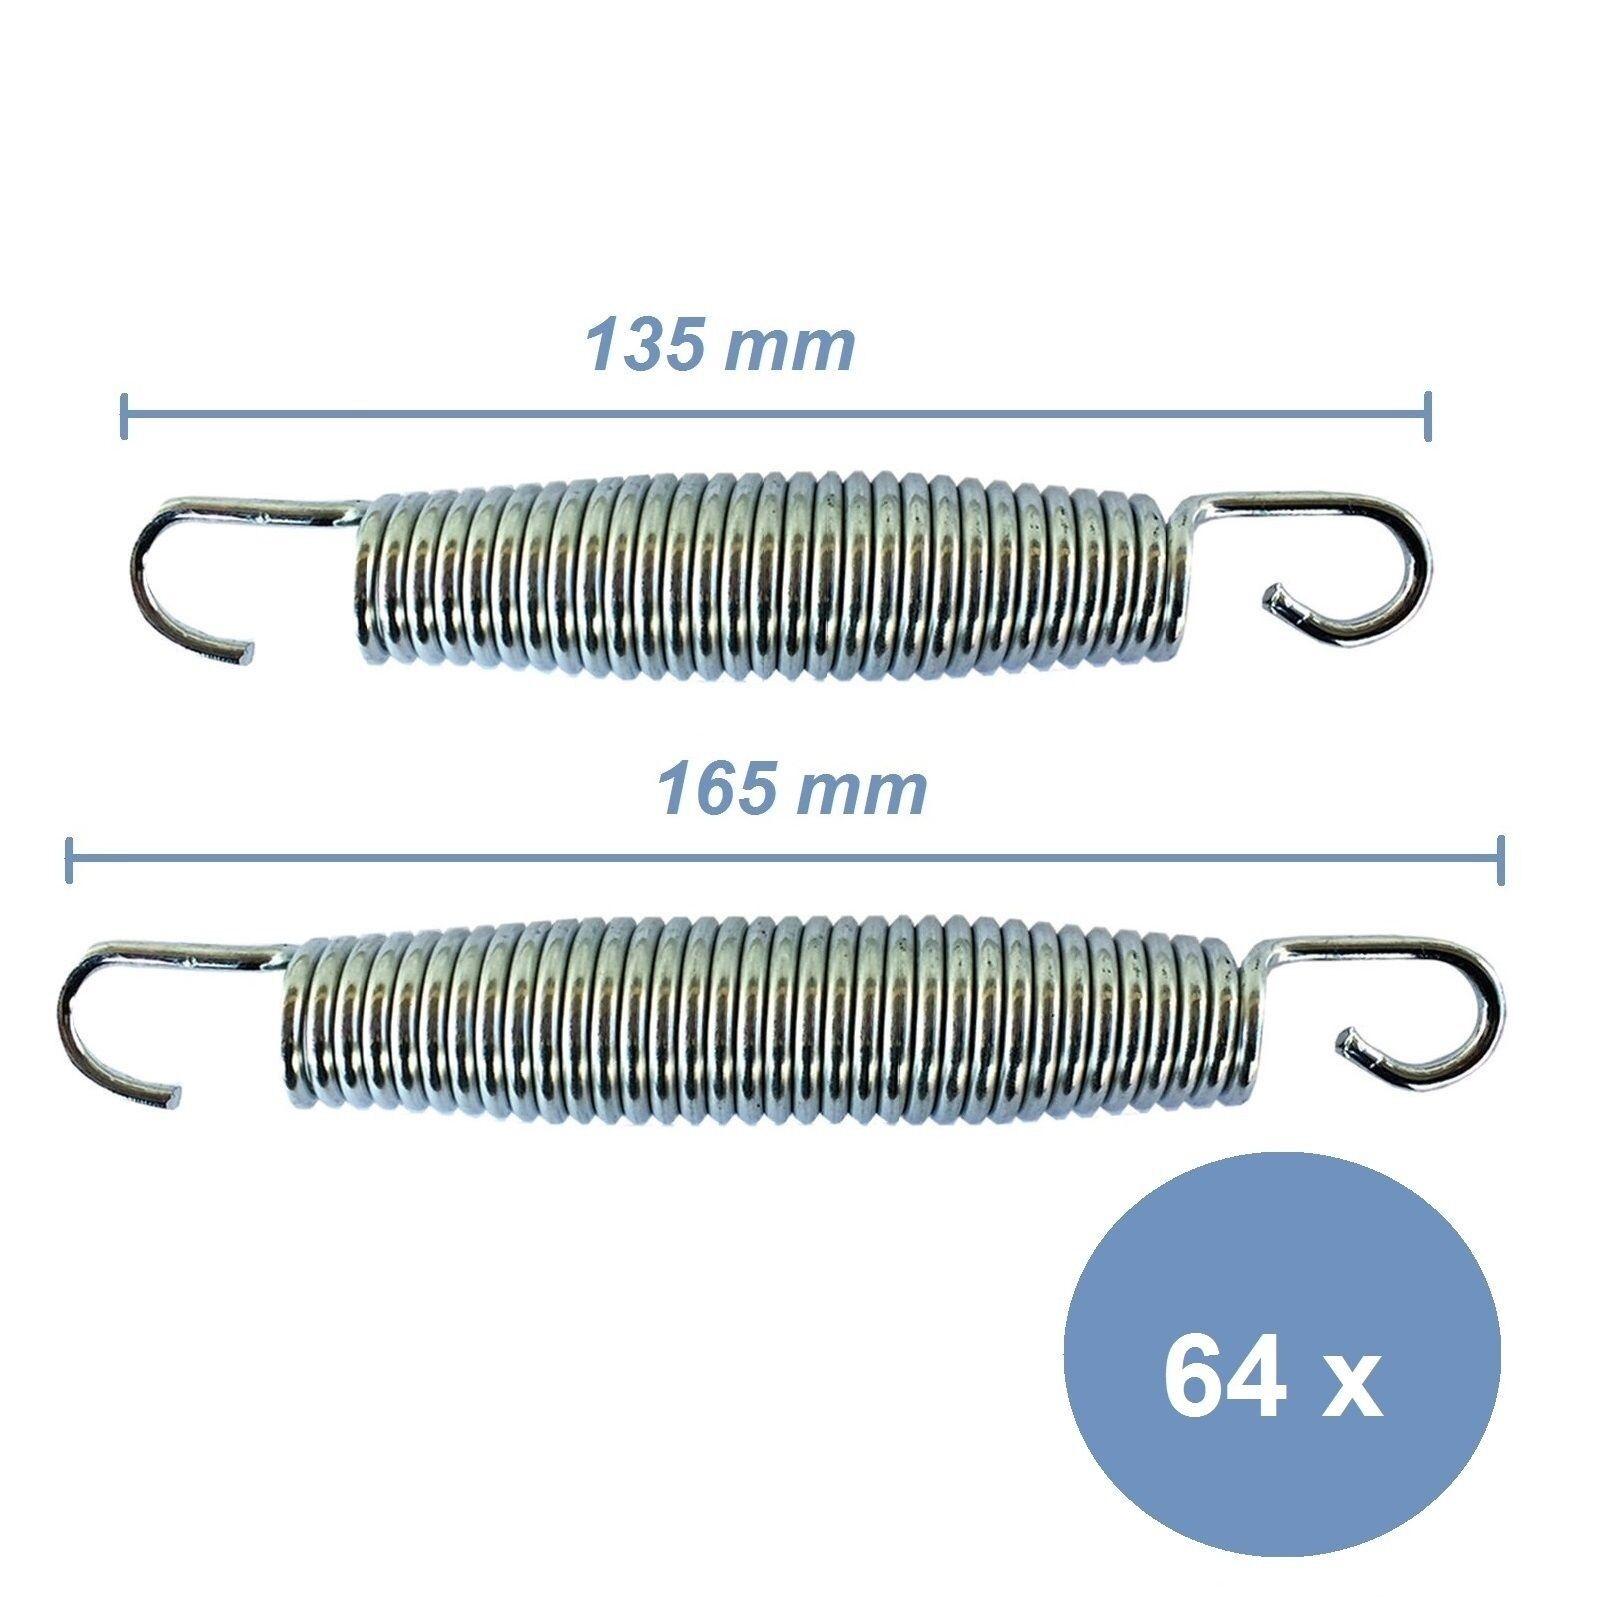 Trampolin Sprungfedern 64 64 64 Stück Trampolinfedern Federn 13 5 cm oder 16 5 cm 9c9cc5